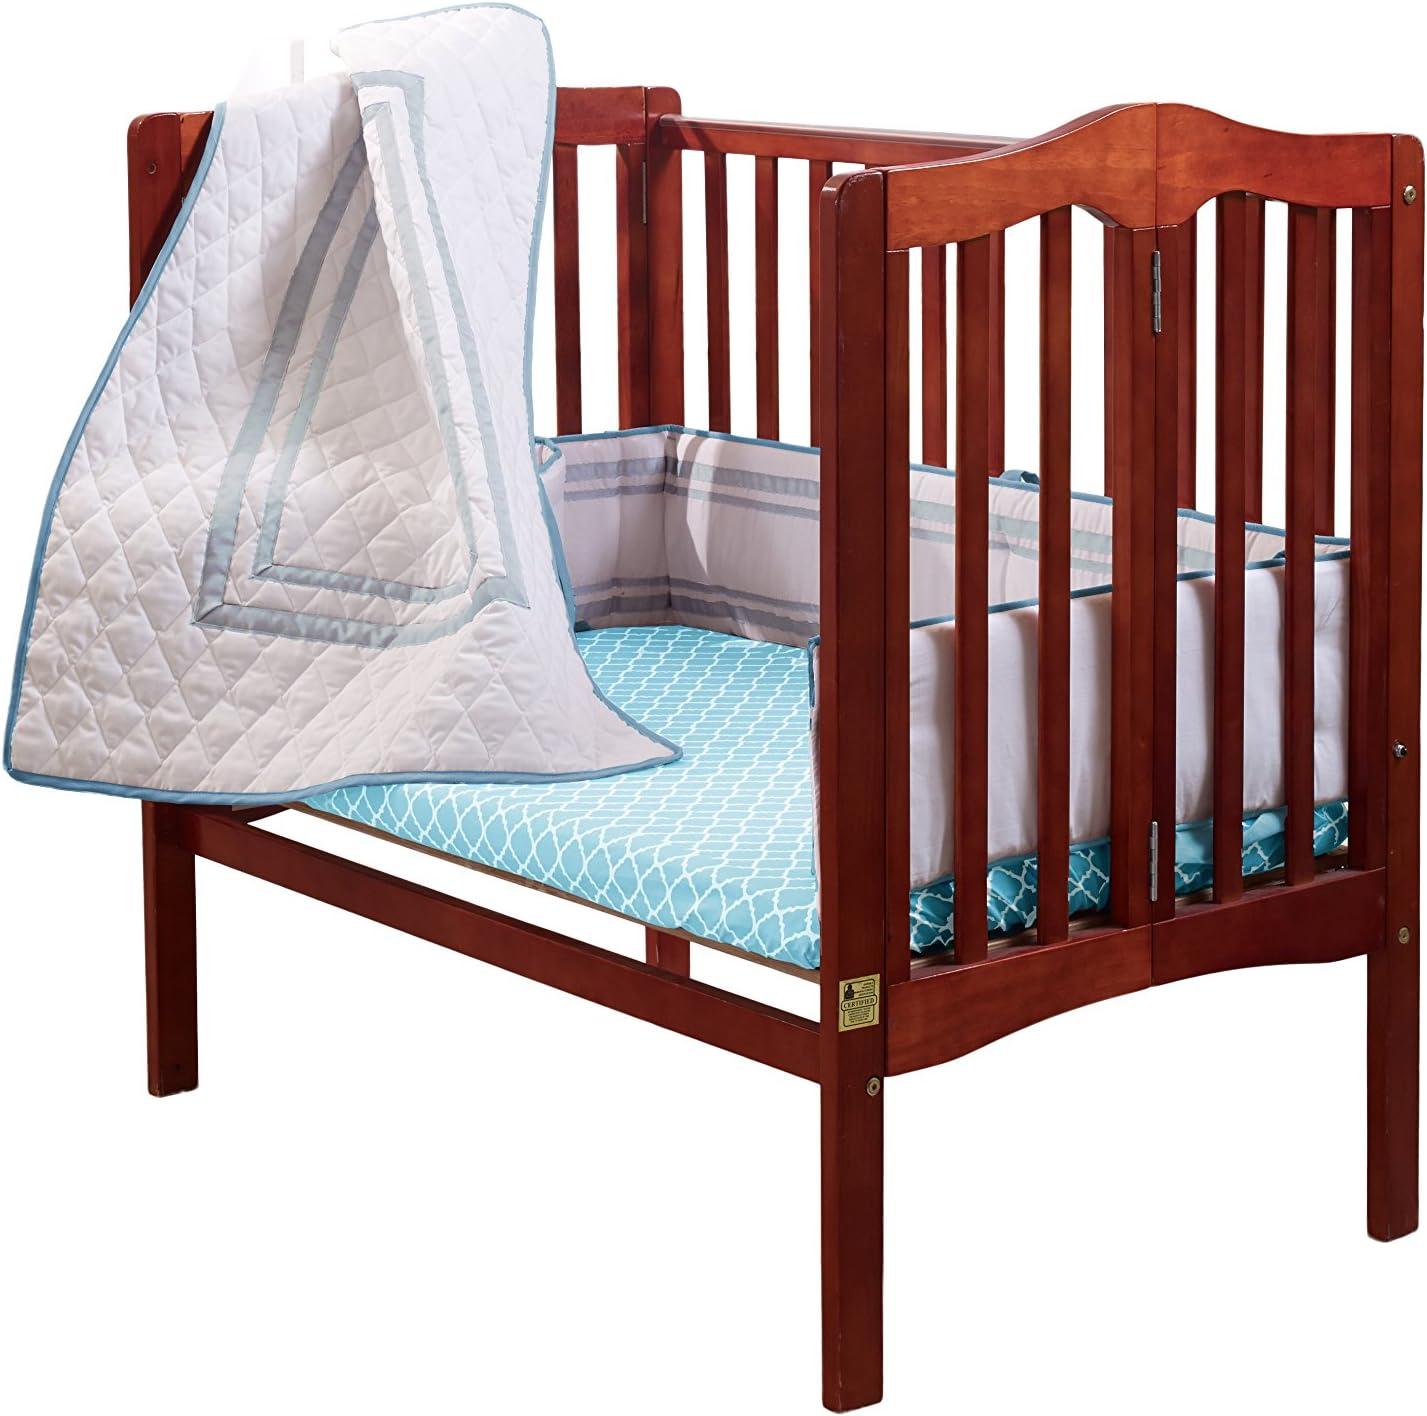 Red BabyDoll 1350pac-red Bedding Soho Mini Crib//Port-A-Crib Bedding-Set